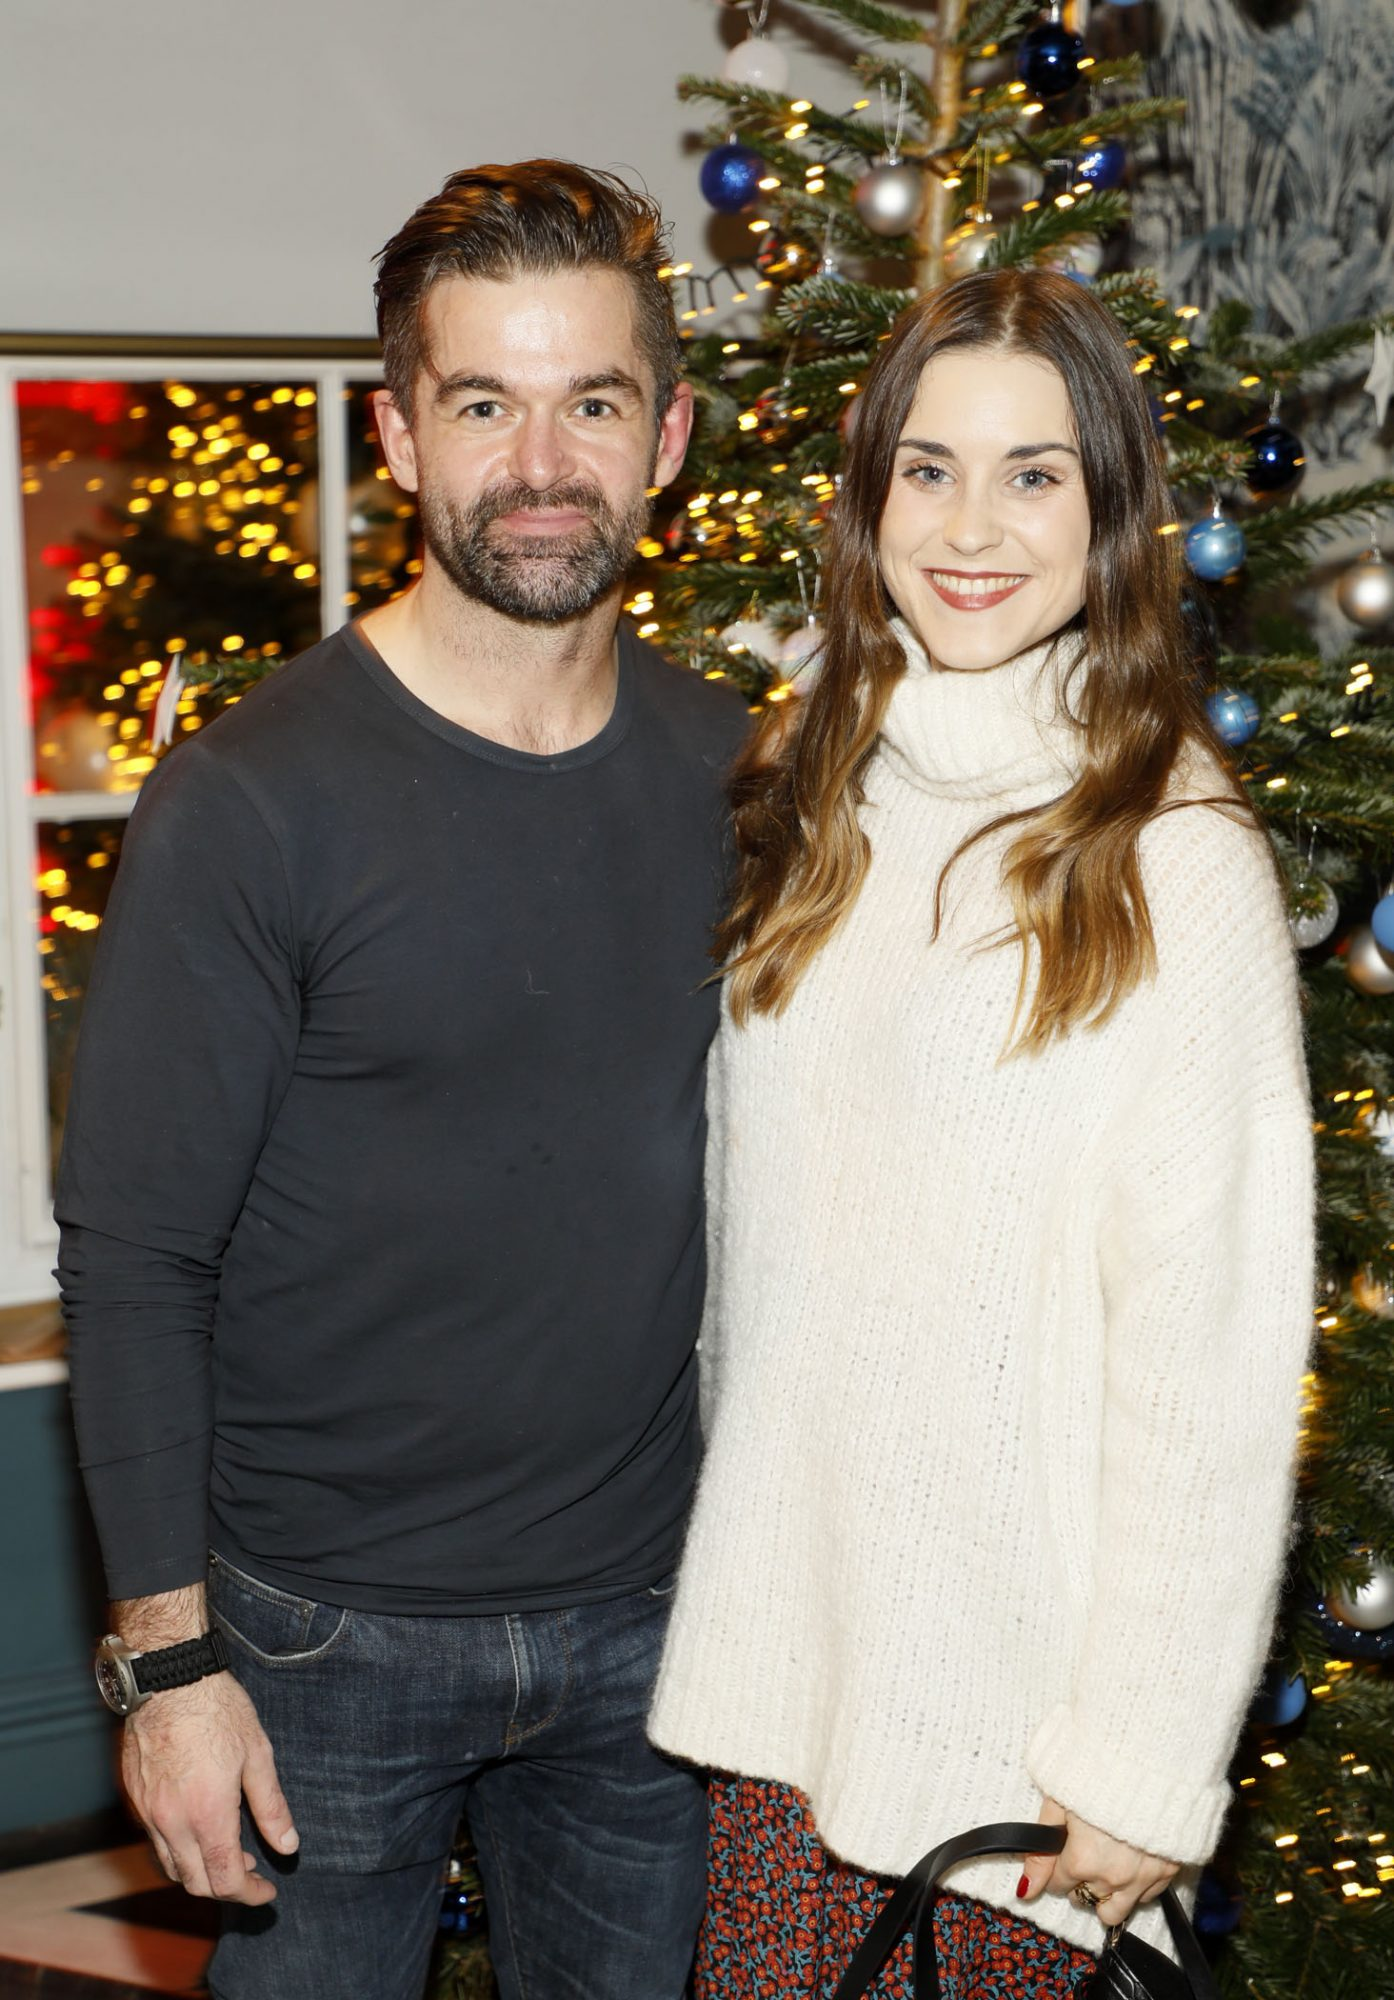 Mike Sheridan and Jo Linehan at the Tesco 2019 Christmas Showcase in Dublin's Iveagh Garden Hotel.   Photo: Kieran Harnett